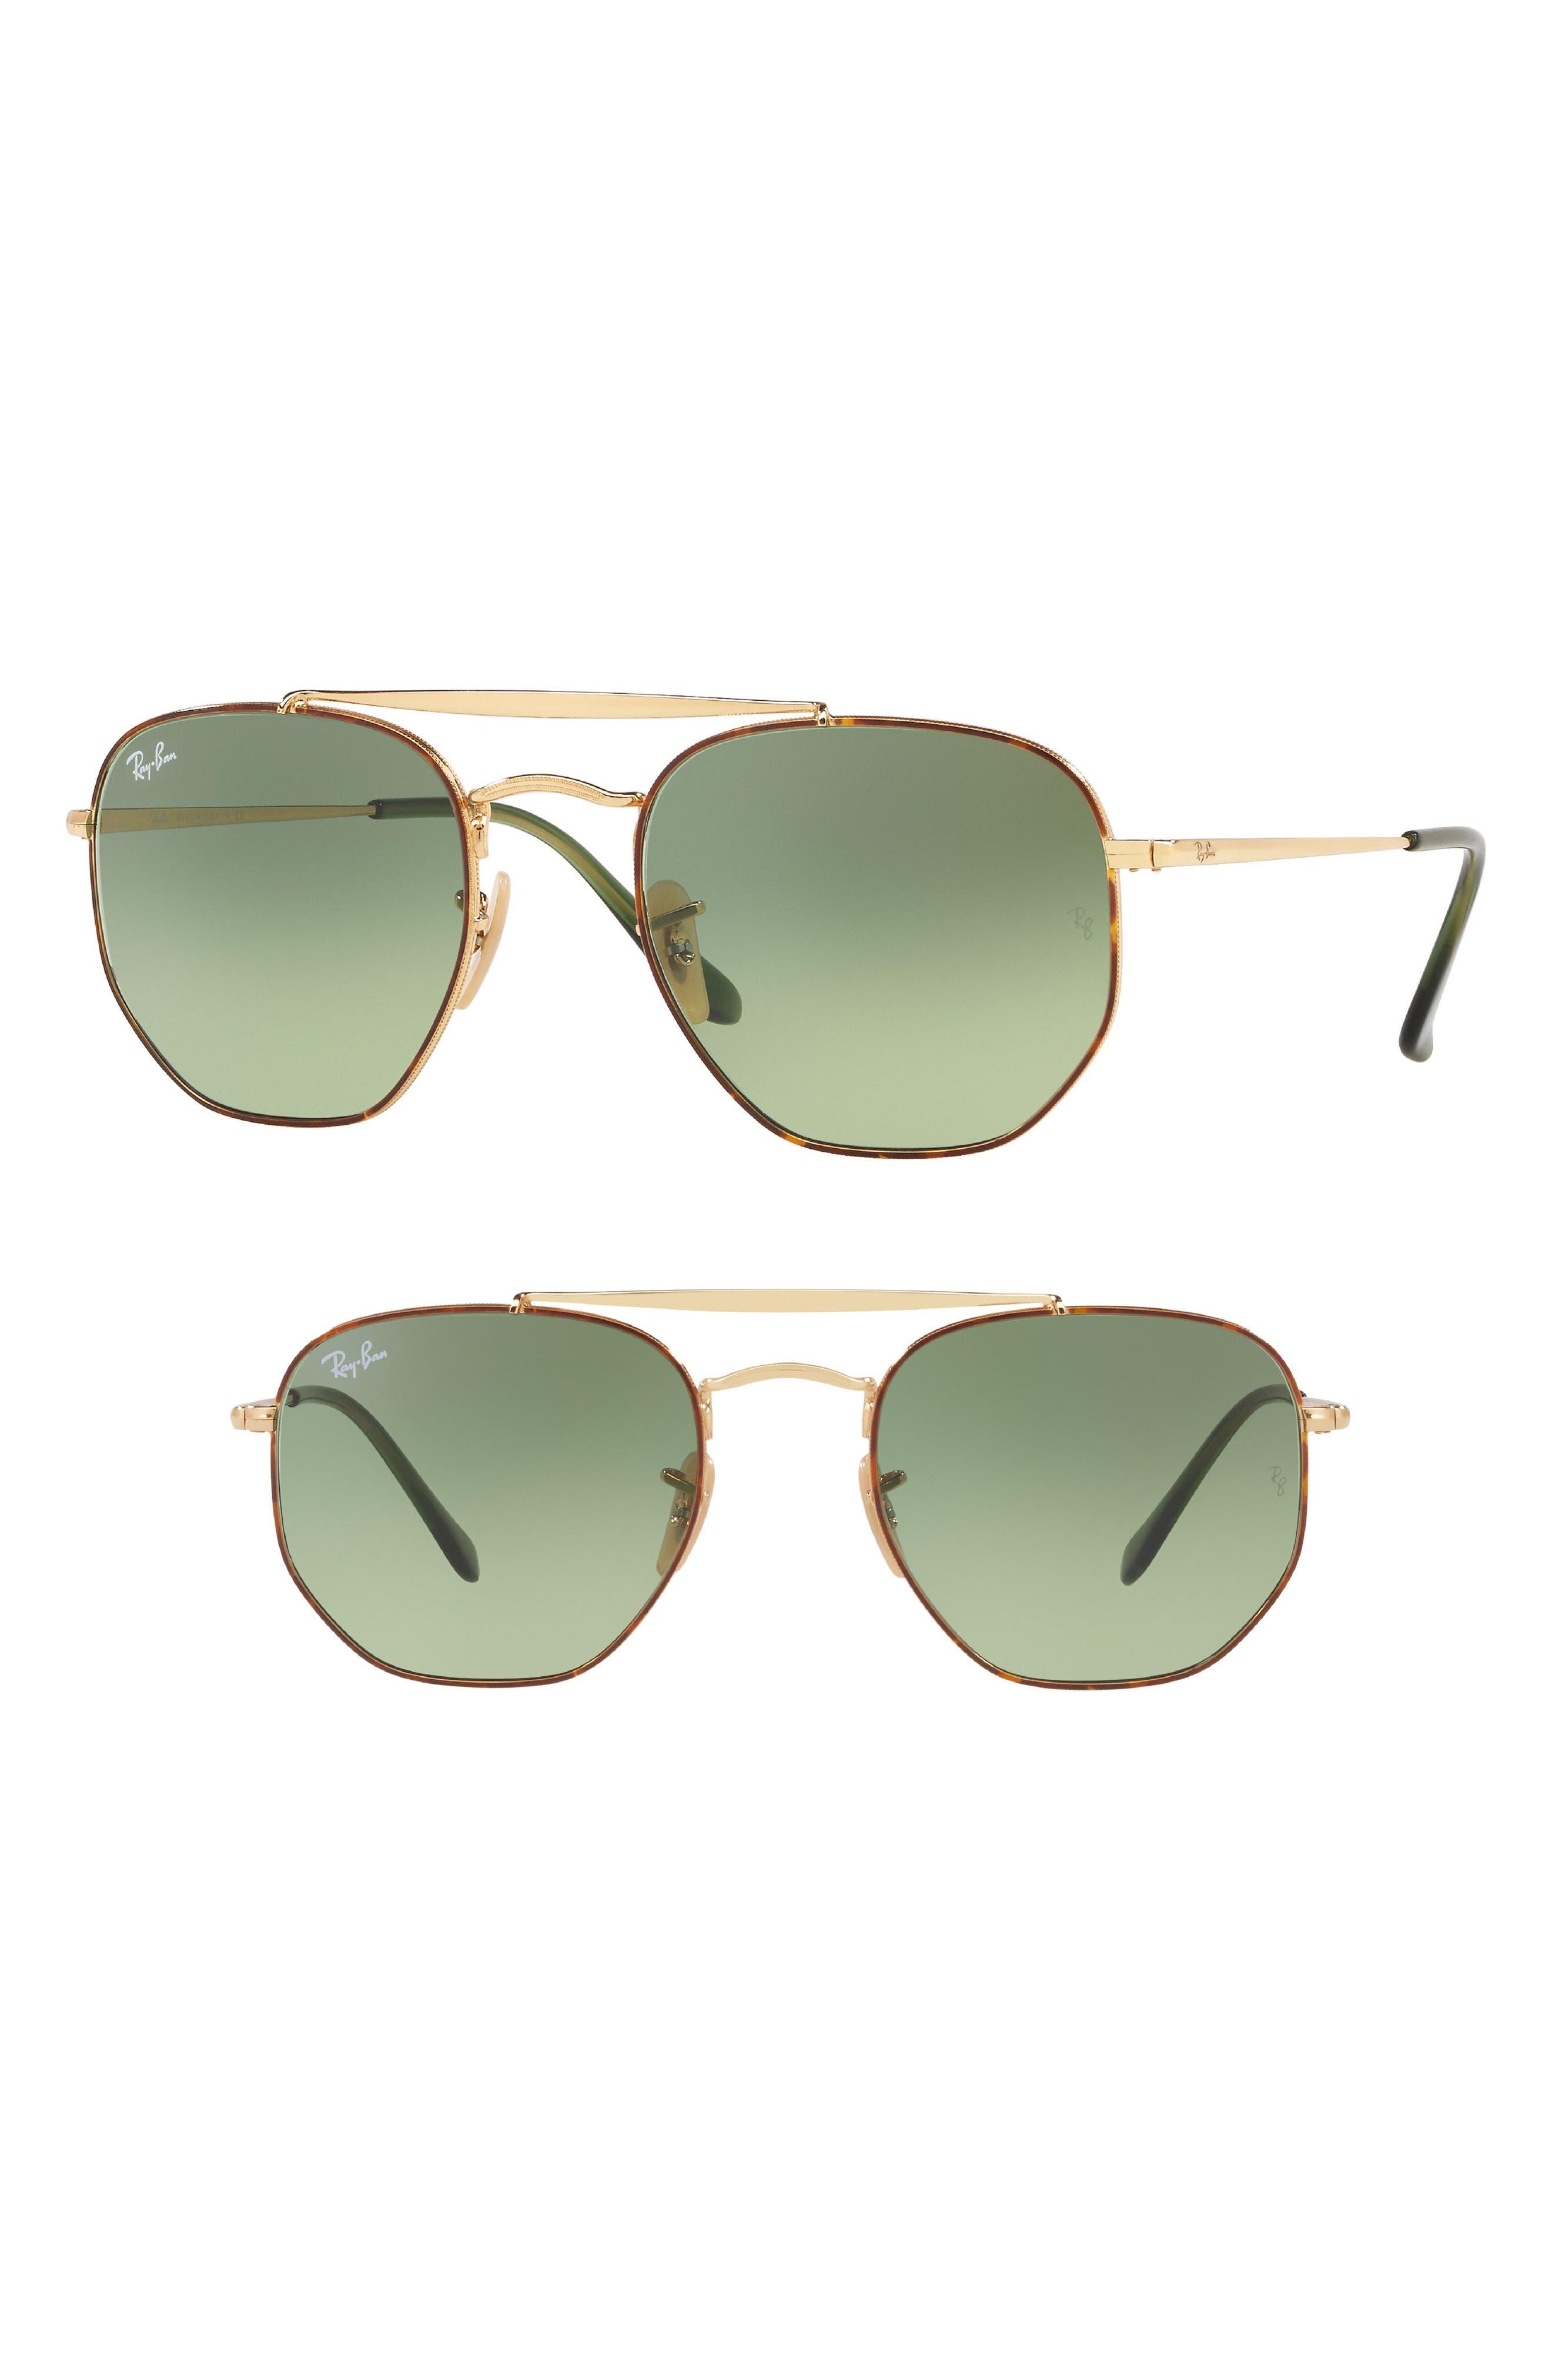 121e6ba9cc2a1 Ray-Ban 5m Gradient Sunglasses - Light Green Gradient